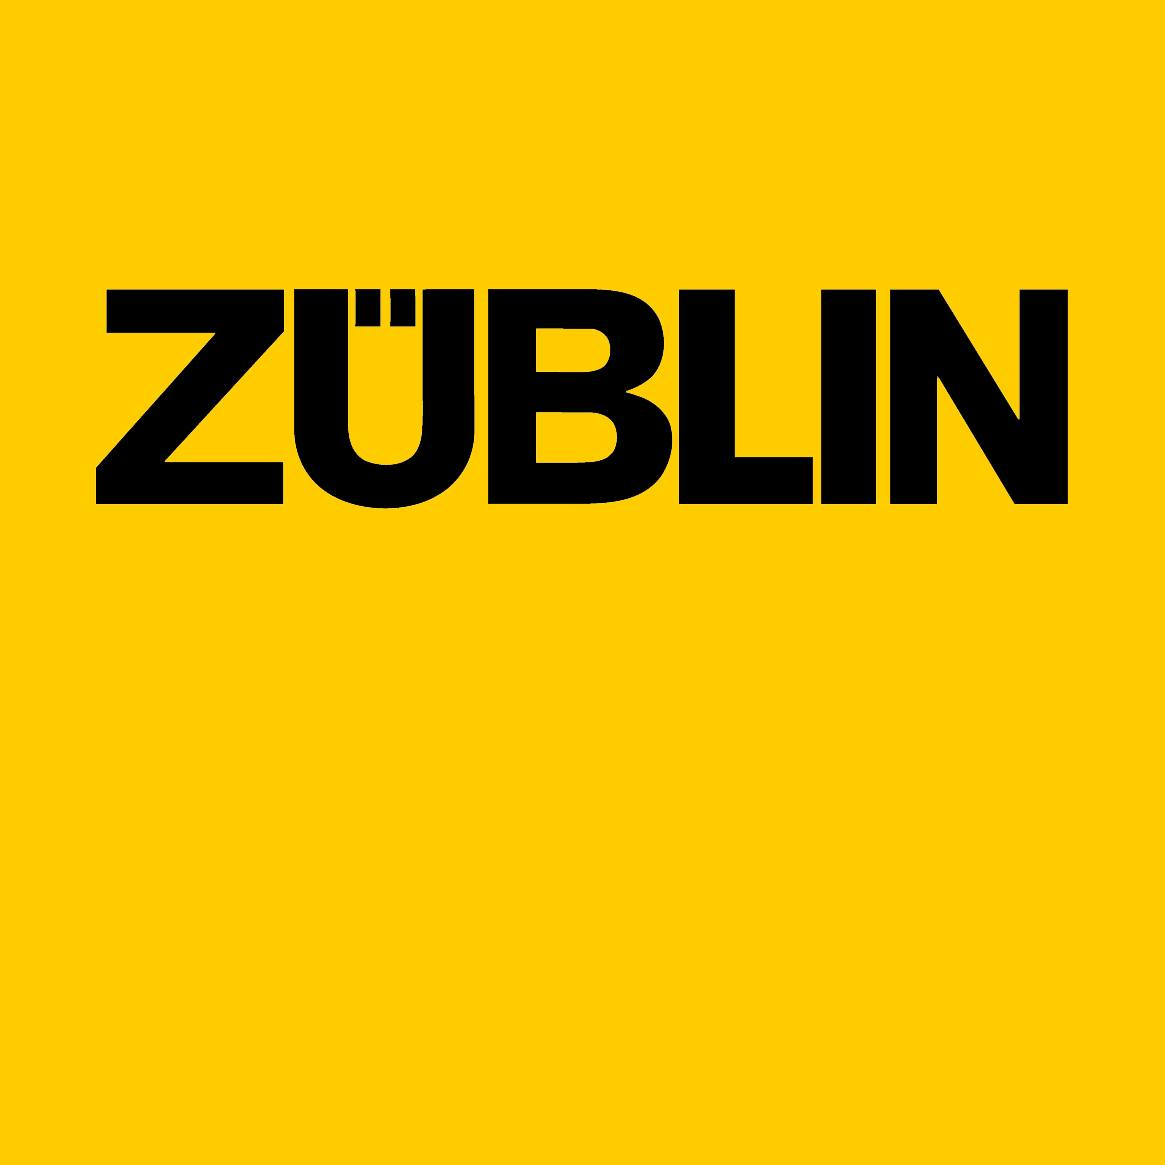 Ed. Züblin AG - Logo: www.zueblin.de/databases/internet/_public/content.nsf/web/EN...